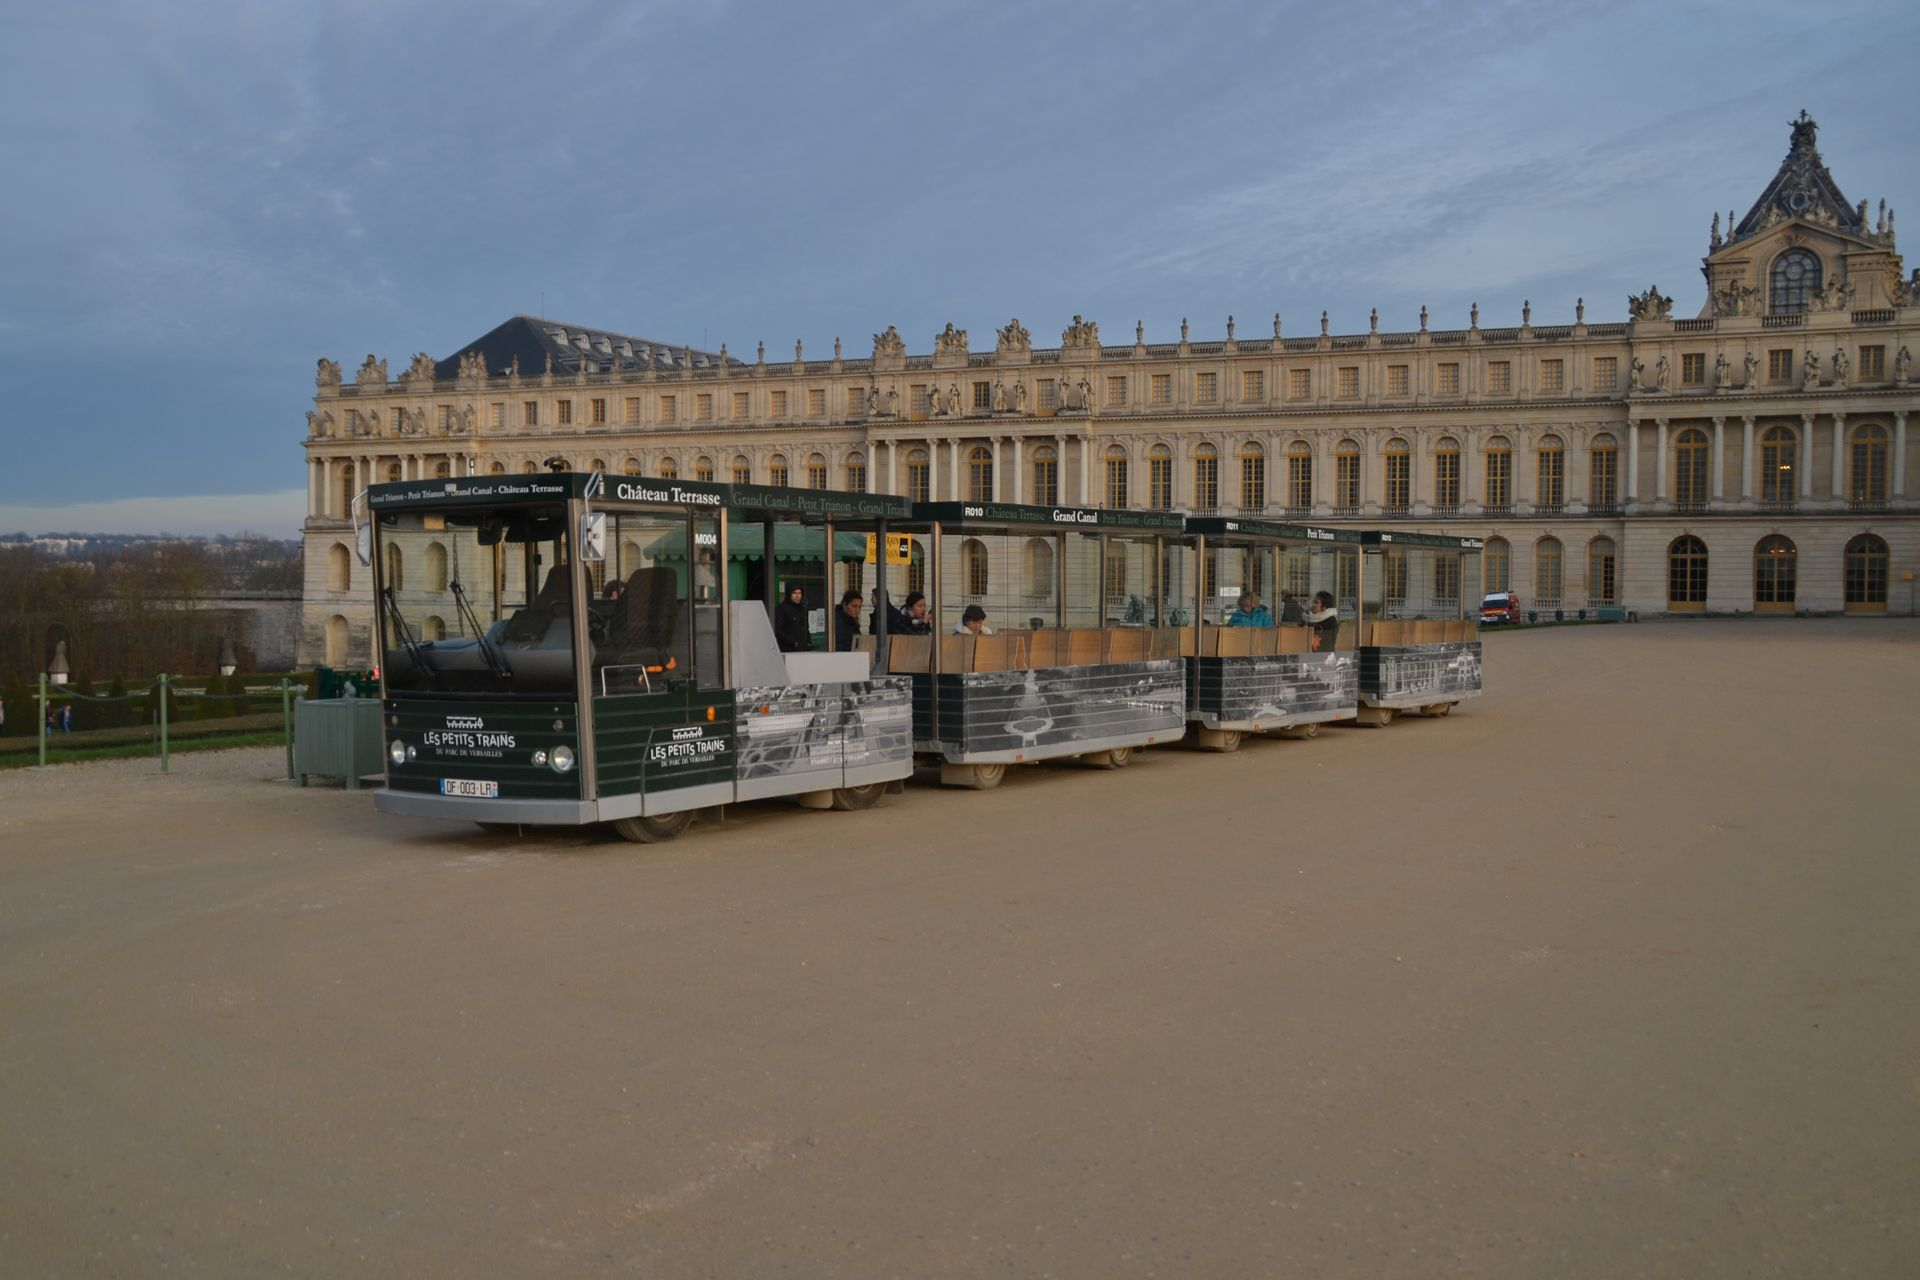 Versailles-i kastély, közúti vonat